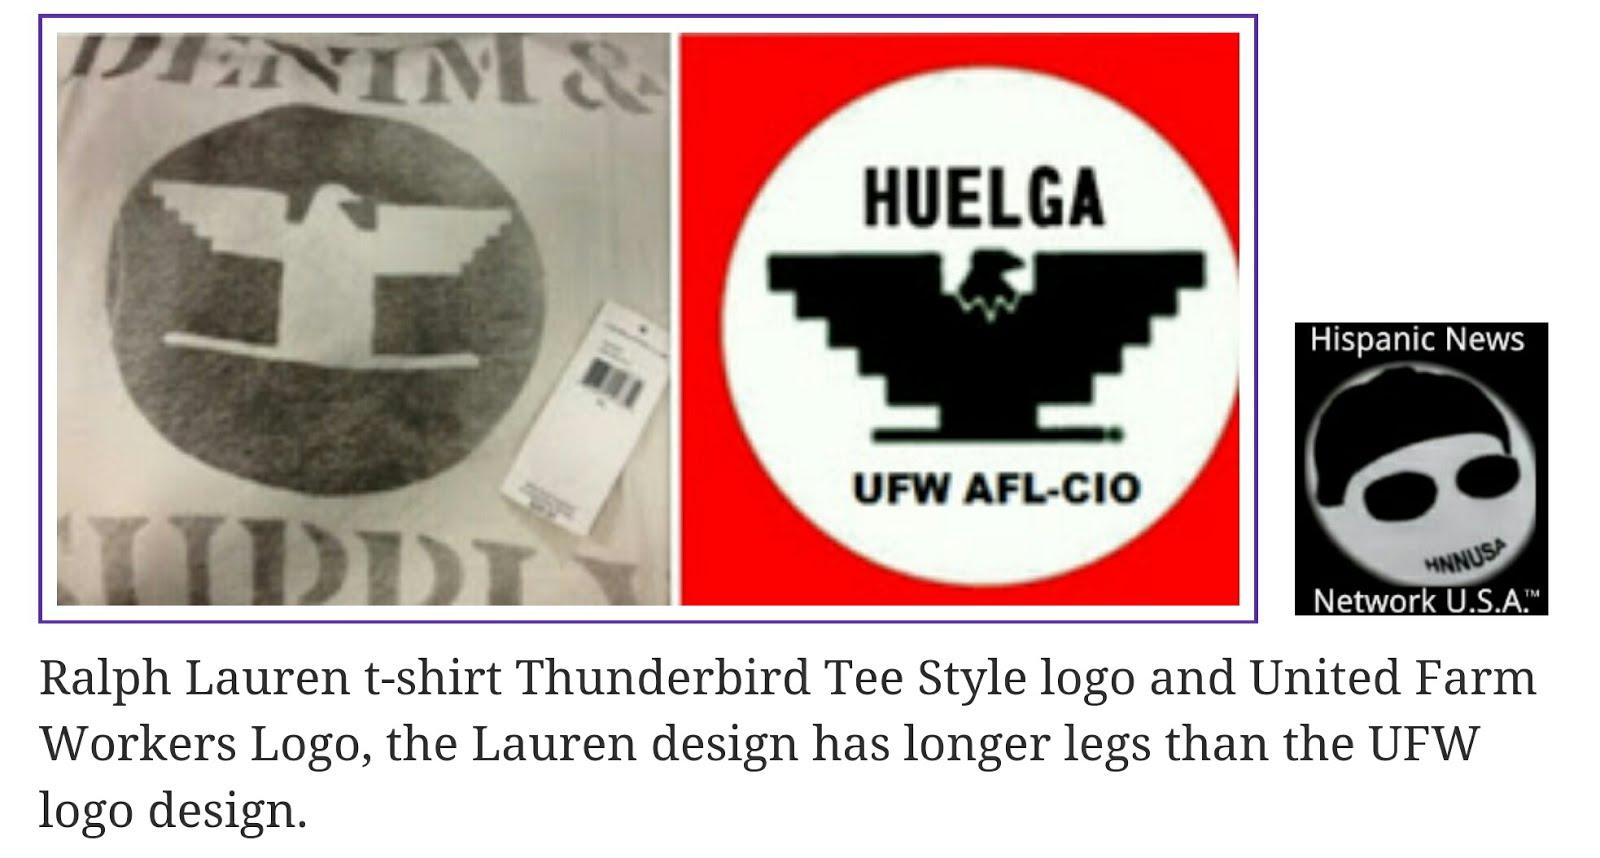 Hispanic News Network U.S.A.: Ralph Lauren Discontinued ...